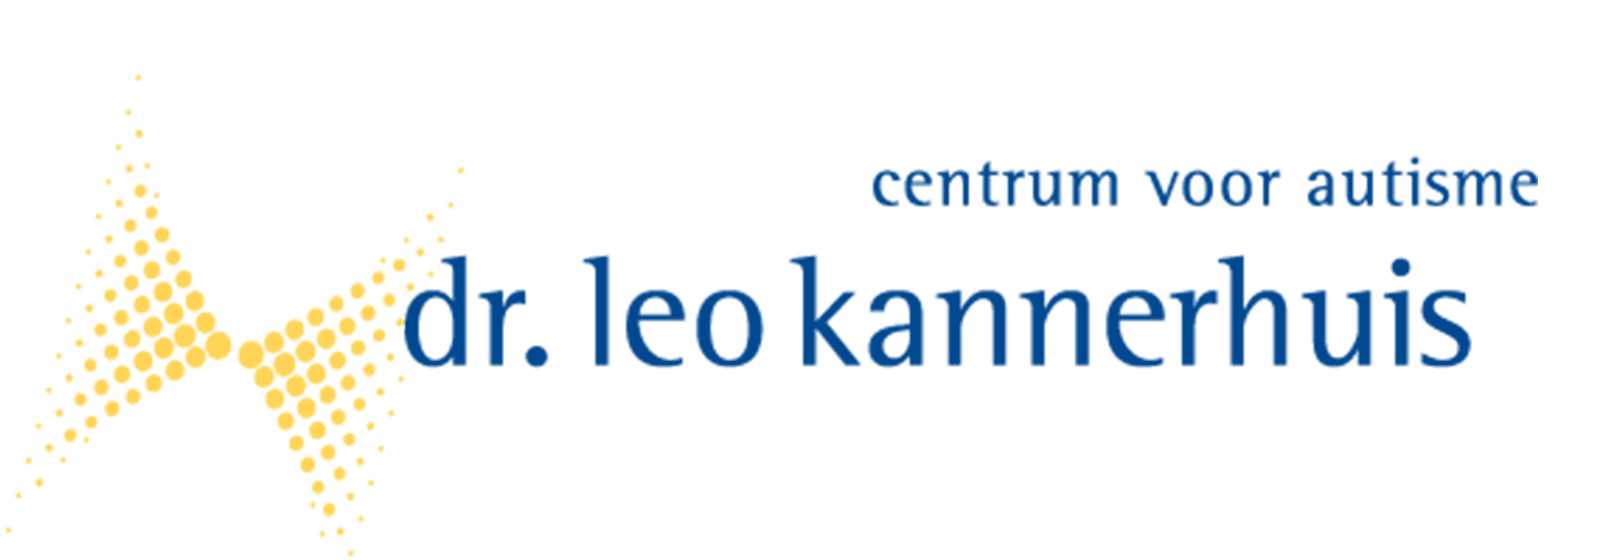 dr-leo-kannerhuis-logo-001